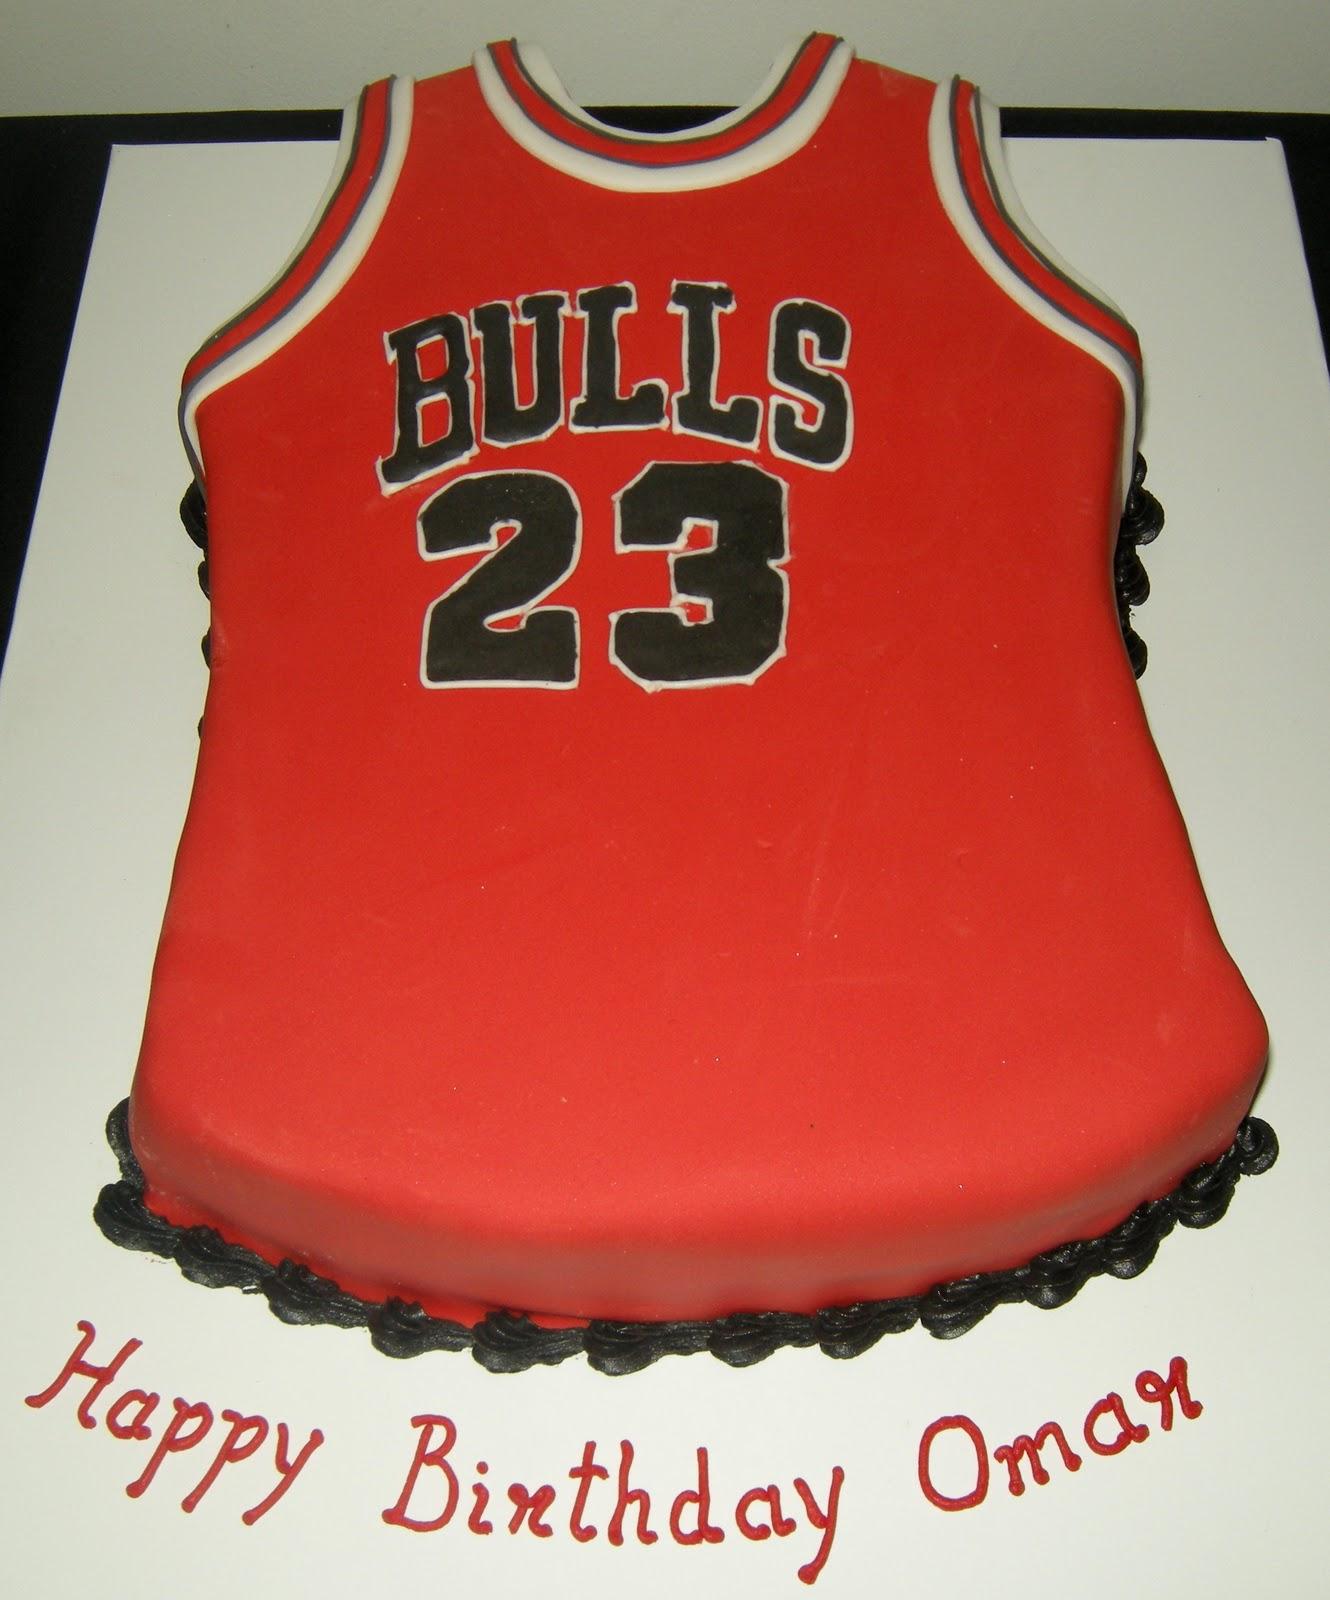 Harshi S Cakes Amp Bakes Bulls Basketball Jersey